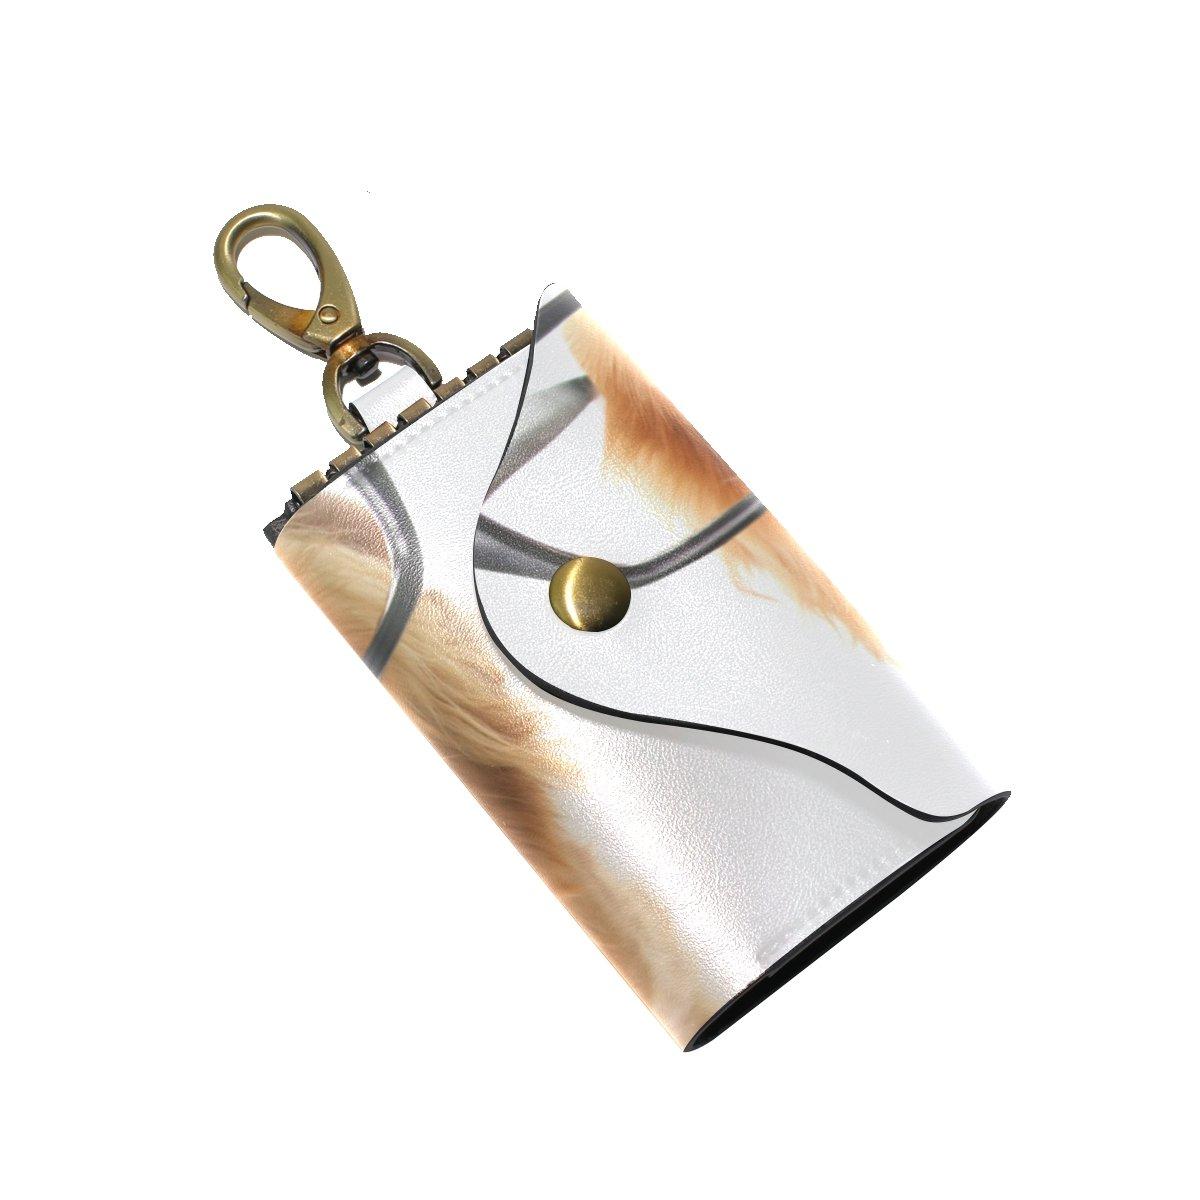 KEAKIA Funny Dachshund Leather Key Case Wallets Tri-fold Key Holder Keychains with 6 Hooks 2 Slot Snap Closure for Men Women